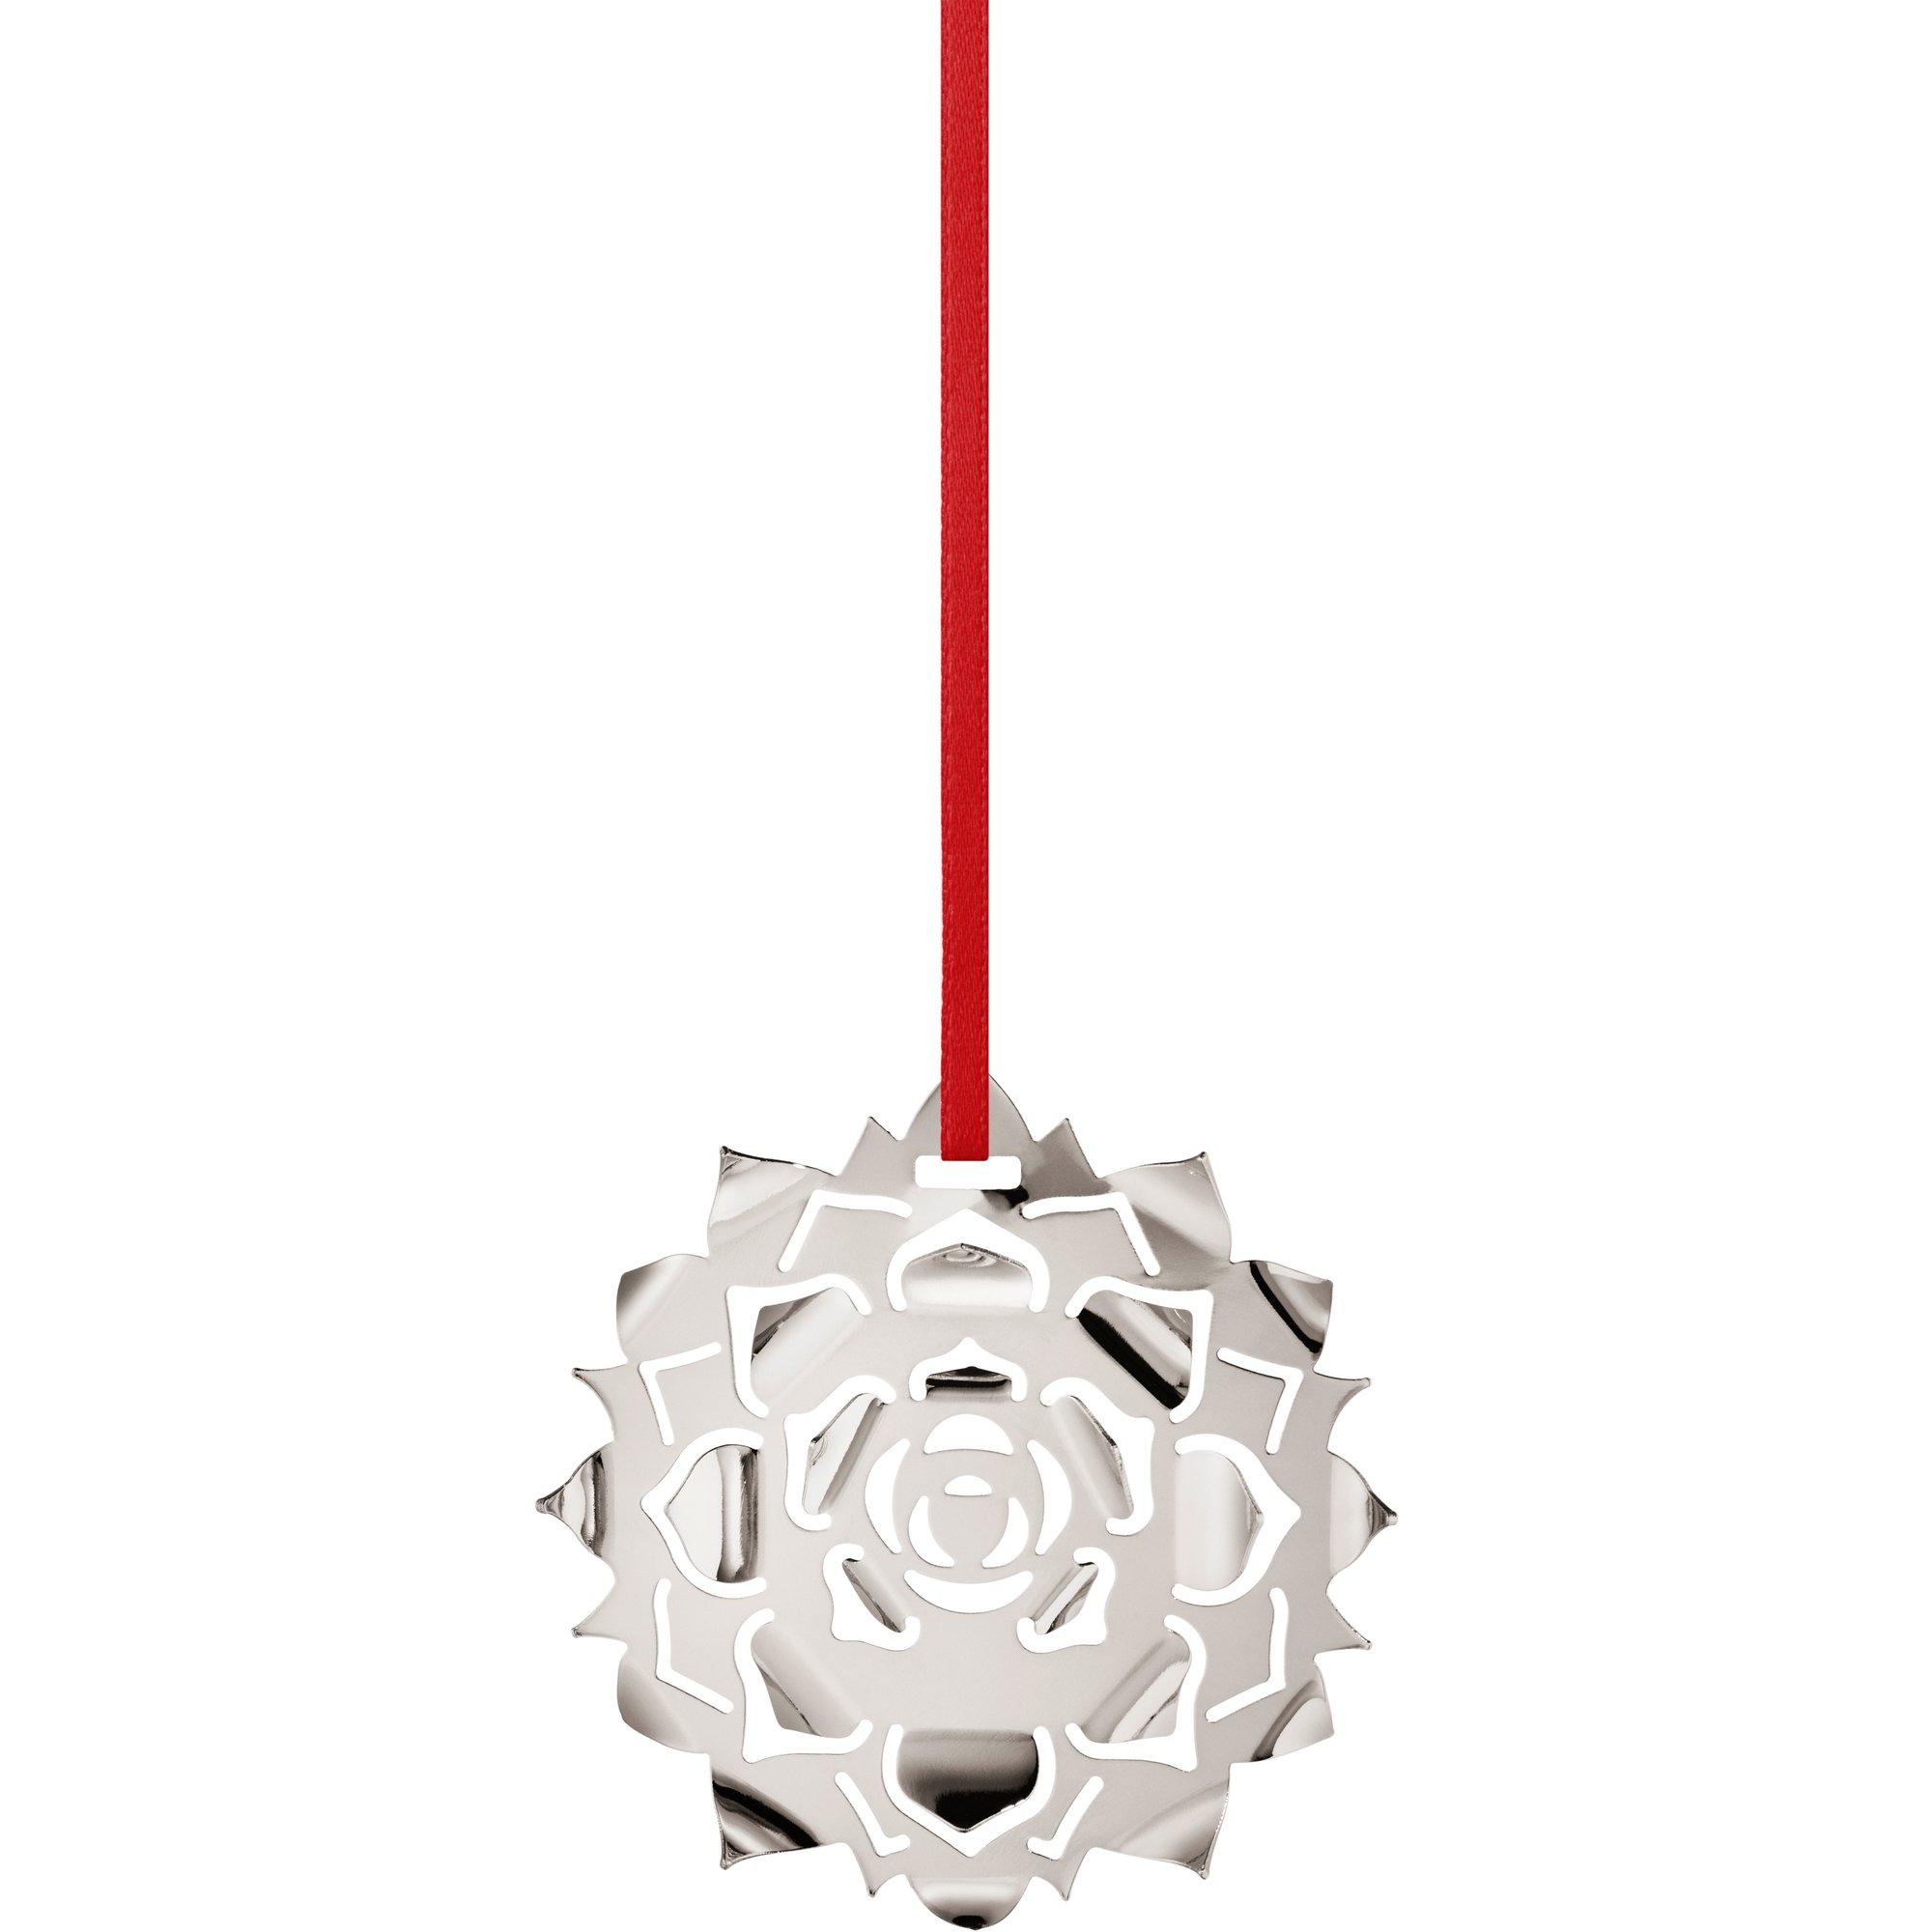 Georg Jensen 2020 Ornament Ice Rosette guld